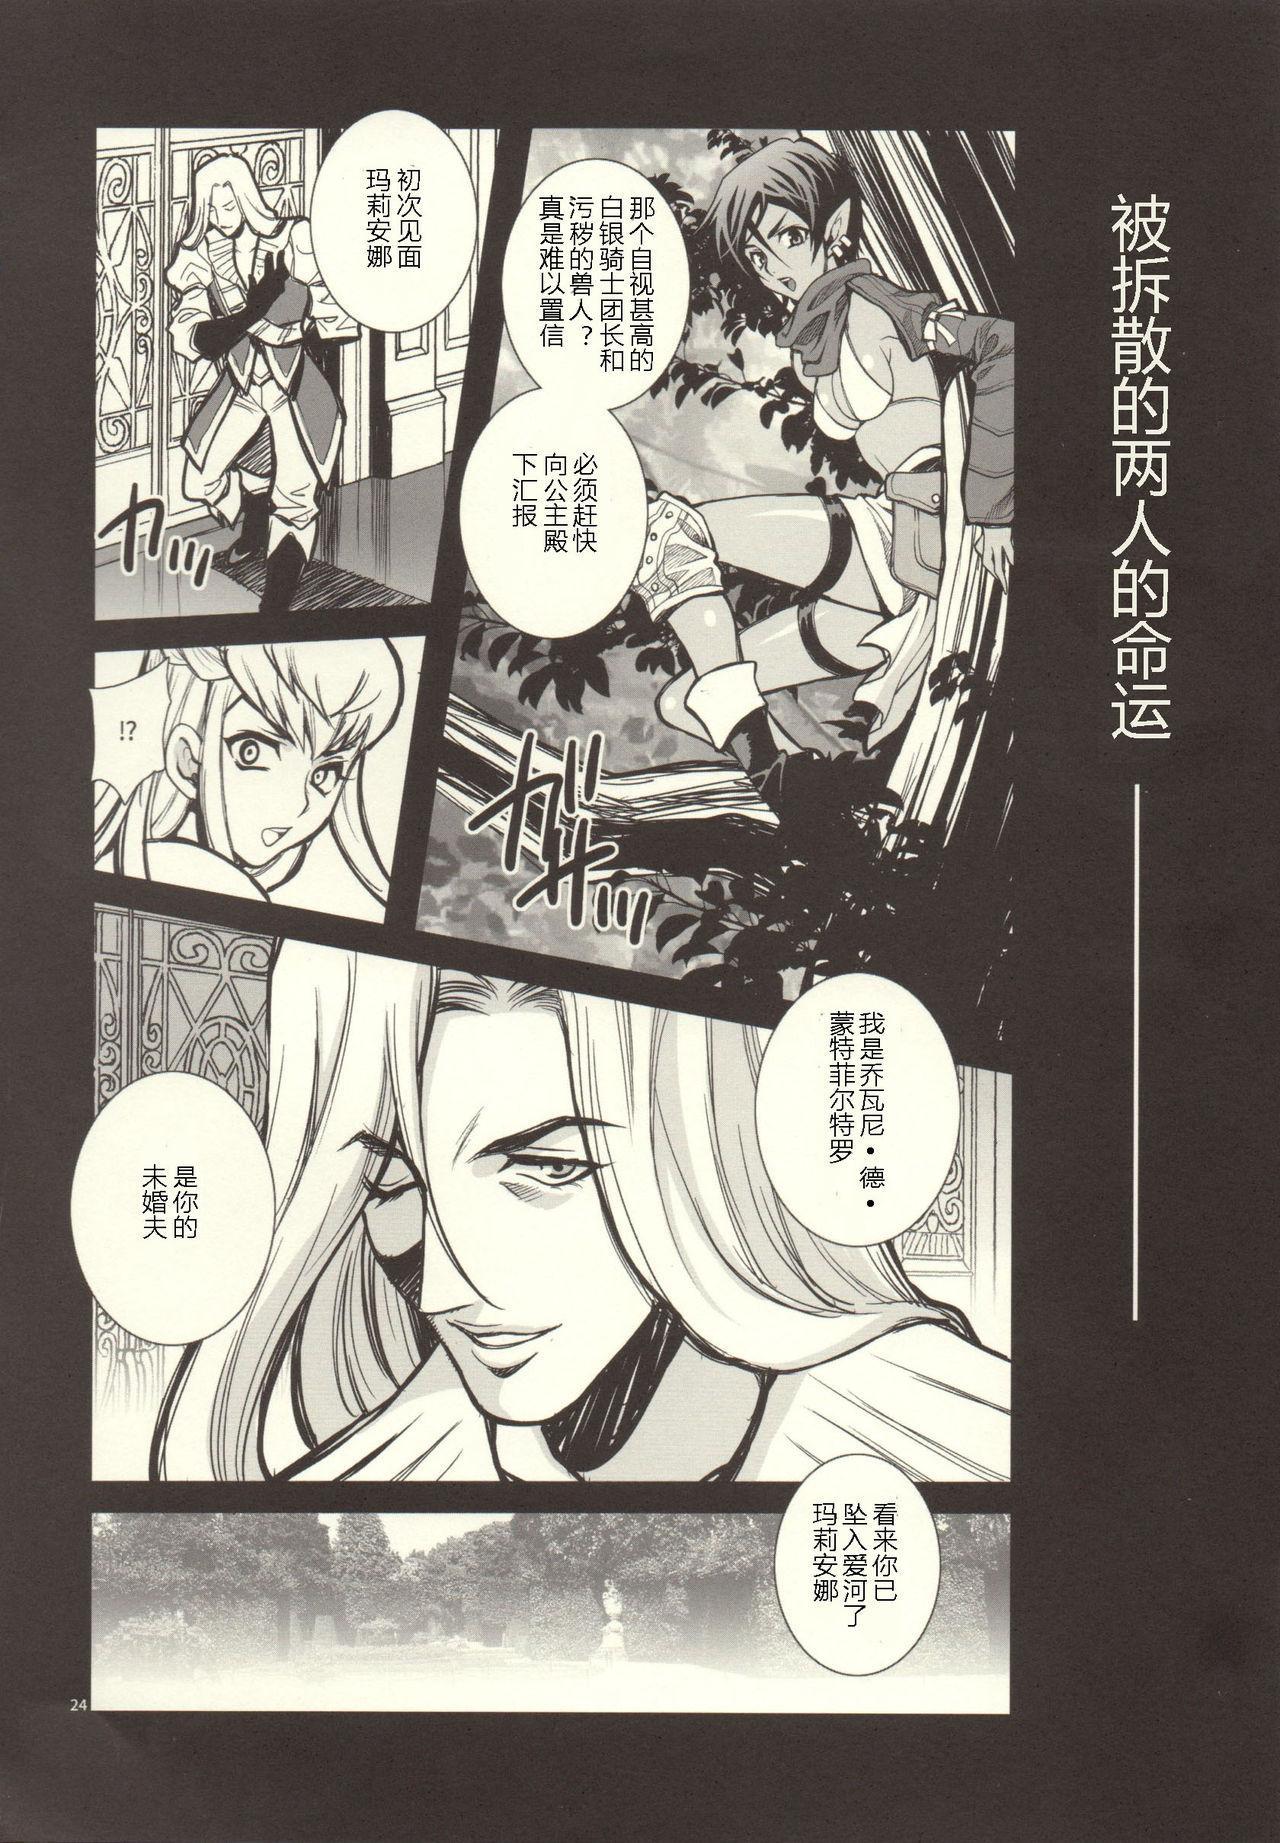 Yukiyanagi no Hon 37 Buta to Onnakishi - Lady knight in love with Orc 22